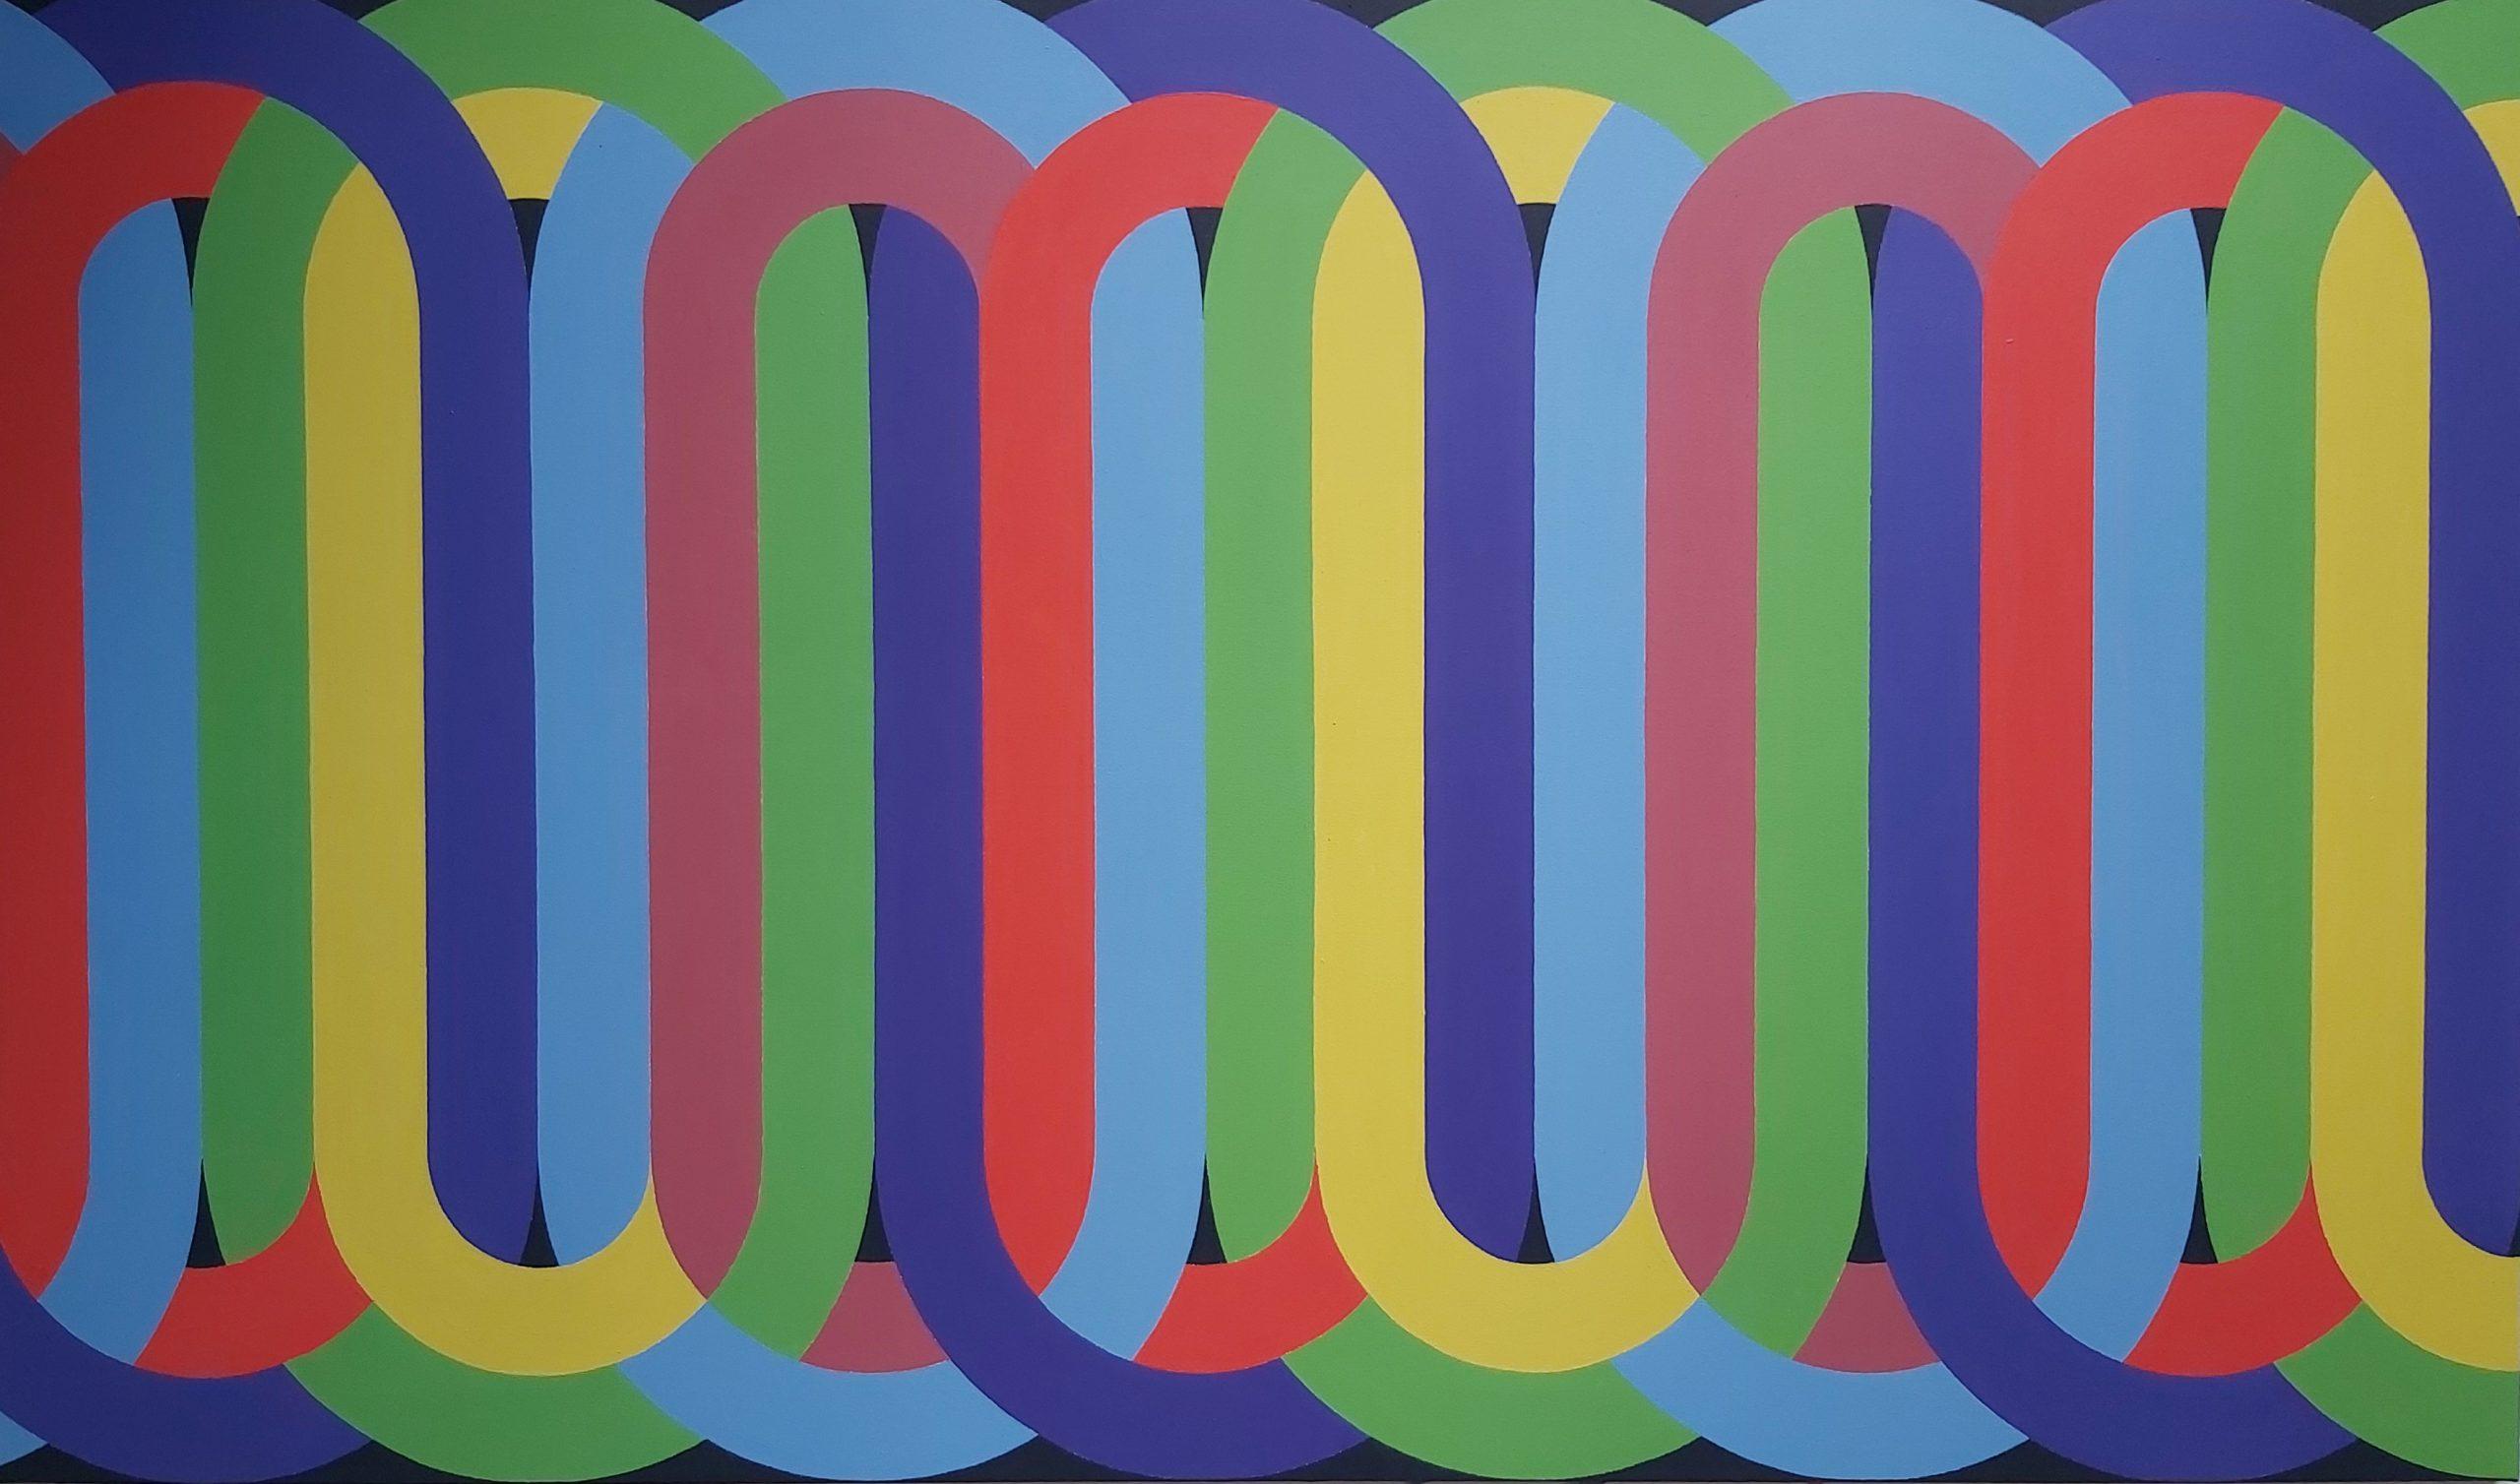 Silsila (Rhythm) 2020 Acrylic on Canvas 107 x 175 cm